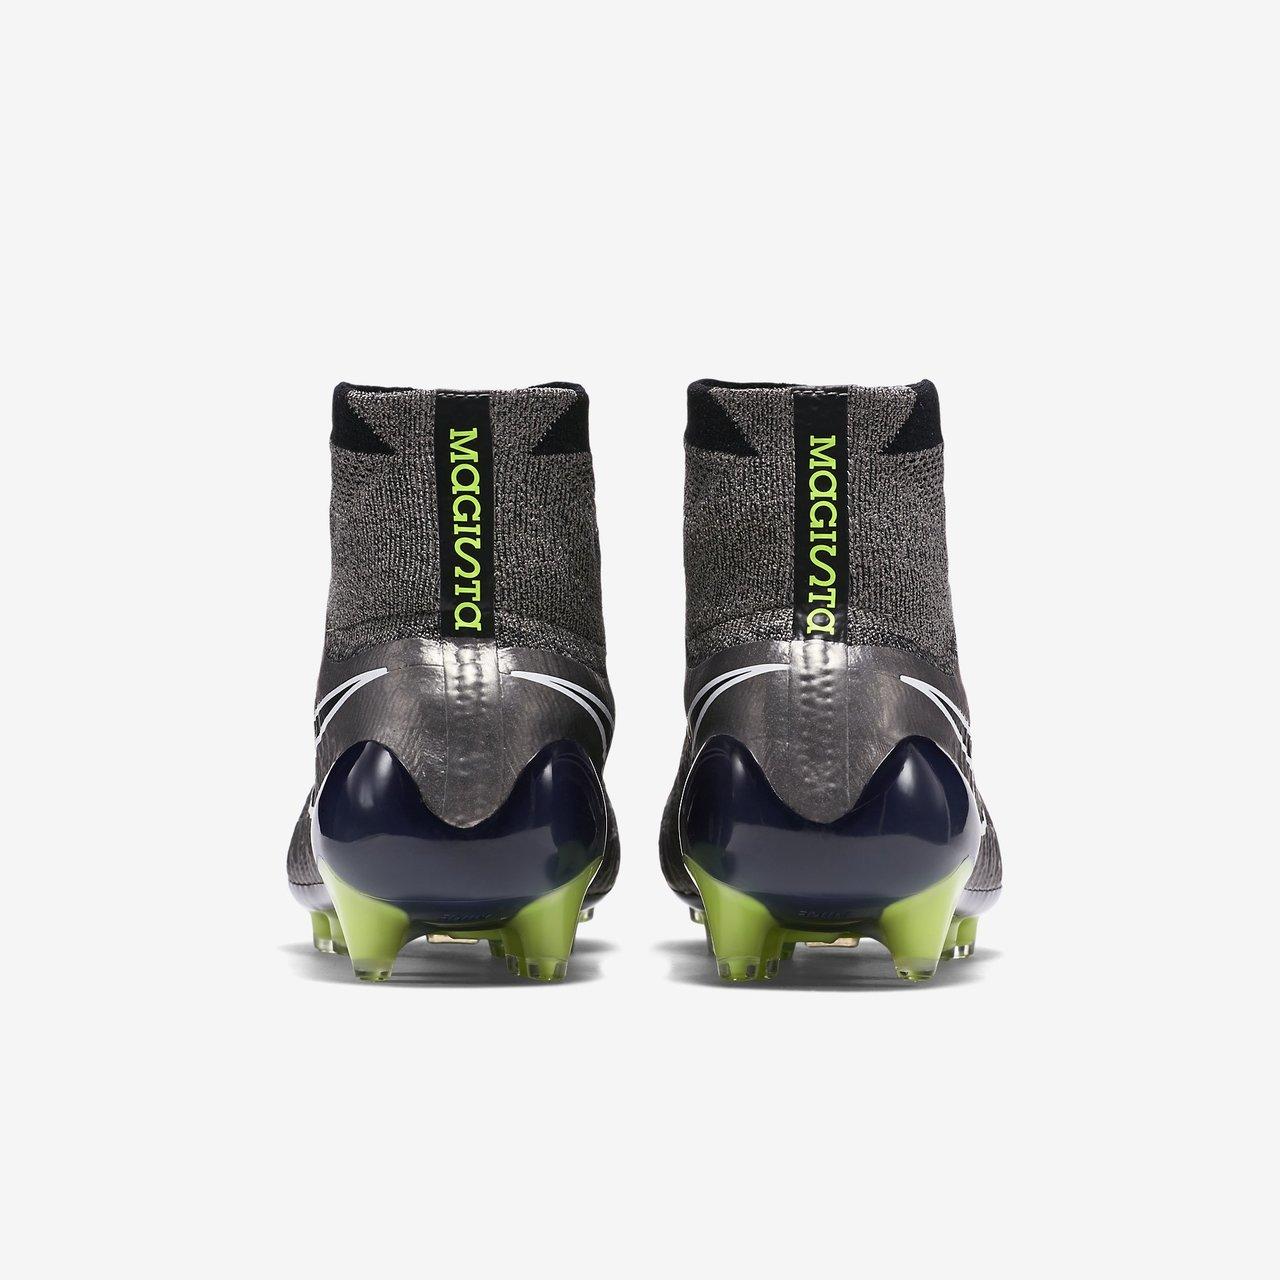 a04d336c752f Nike Magista Obra FG - Liquid Chrome Pack - Metallic Pewter   White ...